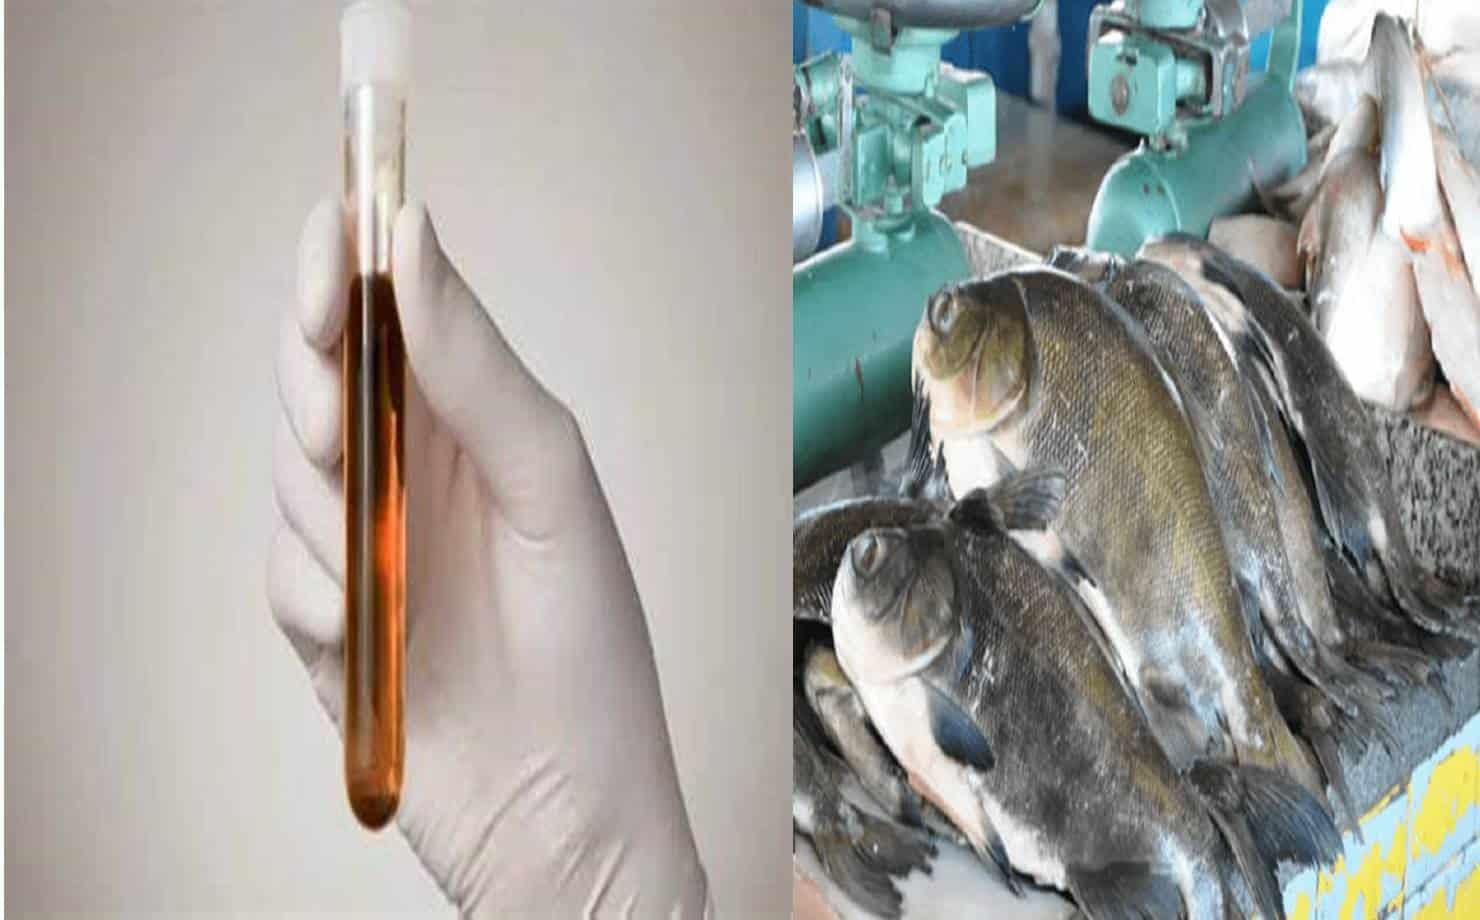 Urina Preta e Peixes